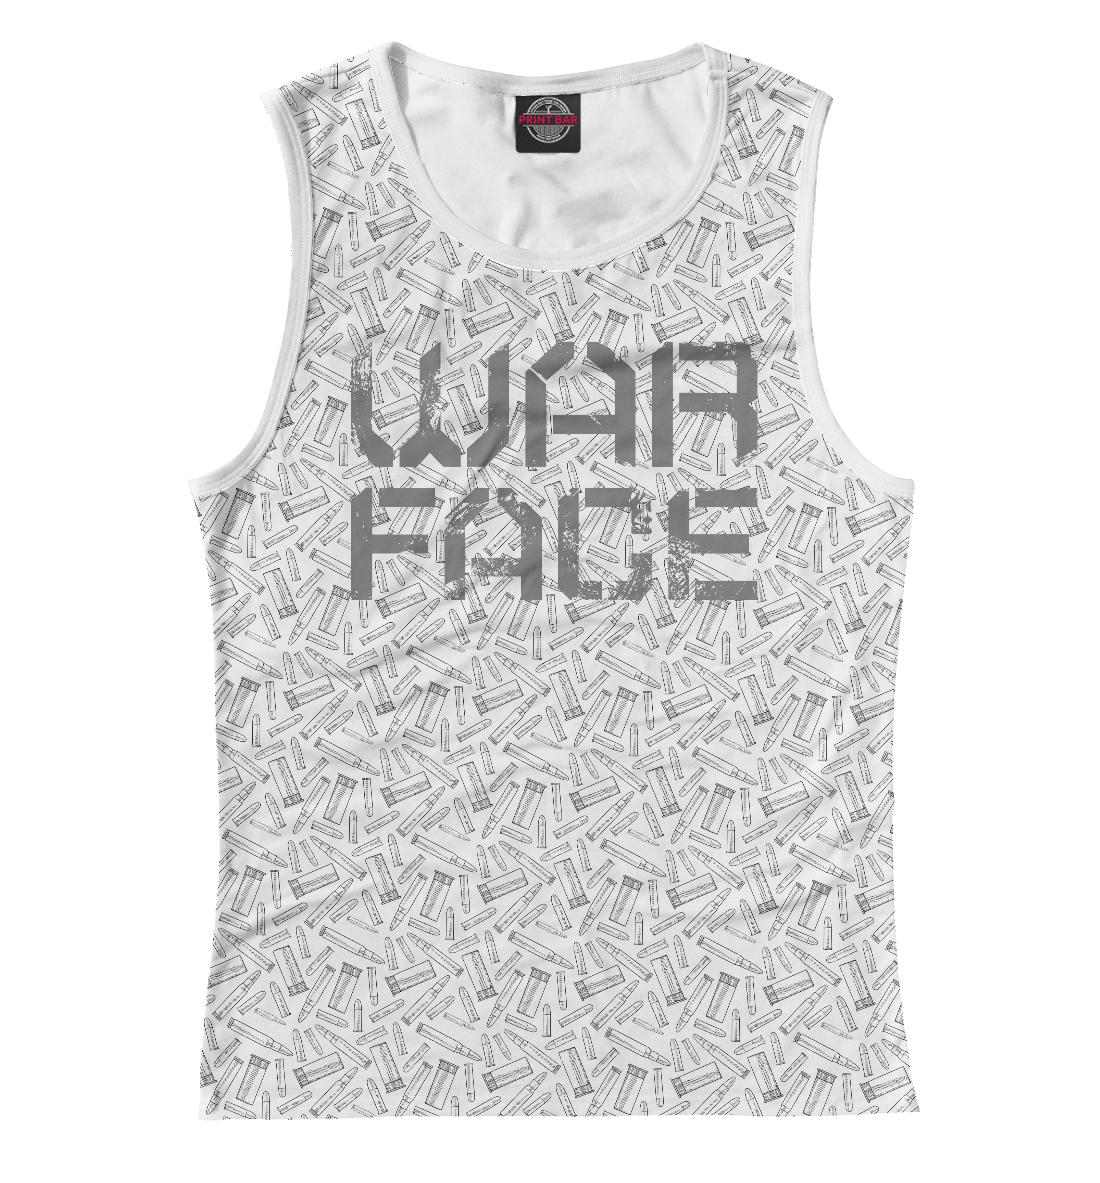 Купить Warface, Printbar, Майки, RPG-126789-may-1